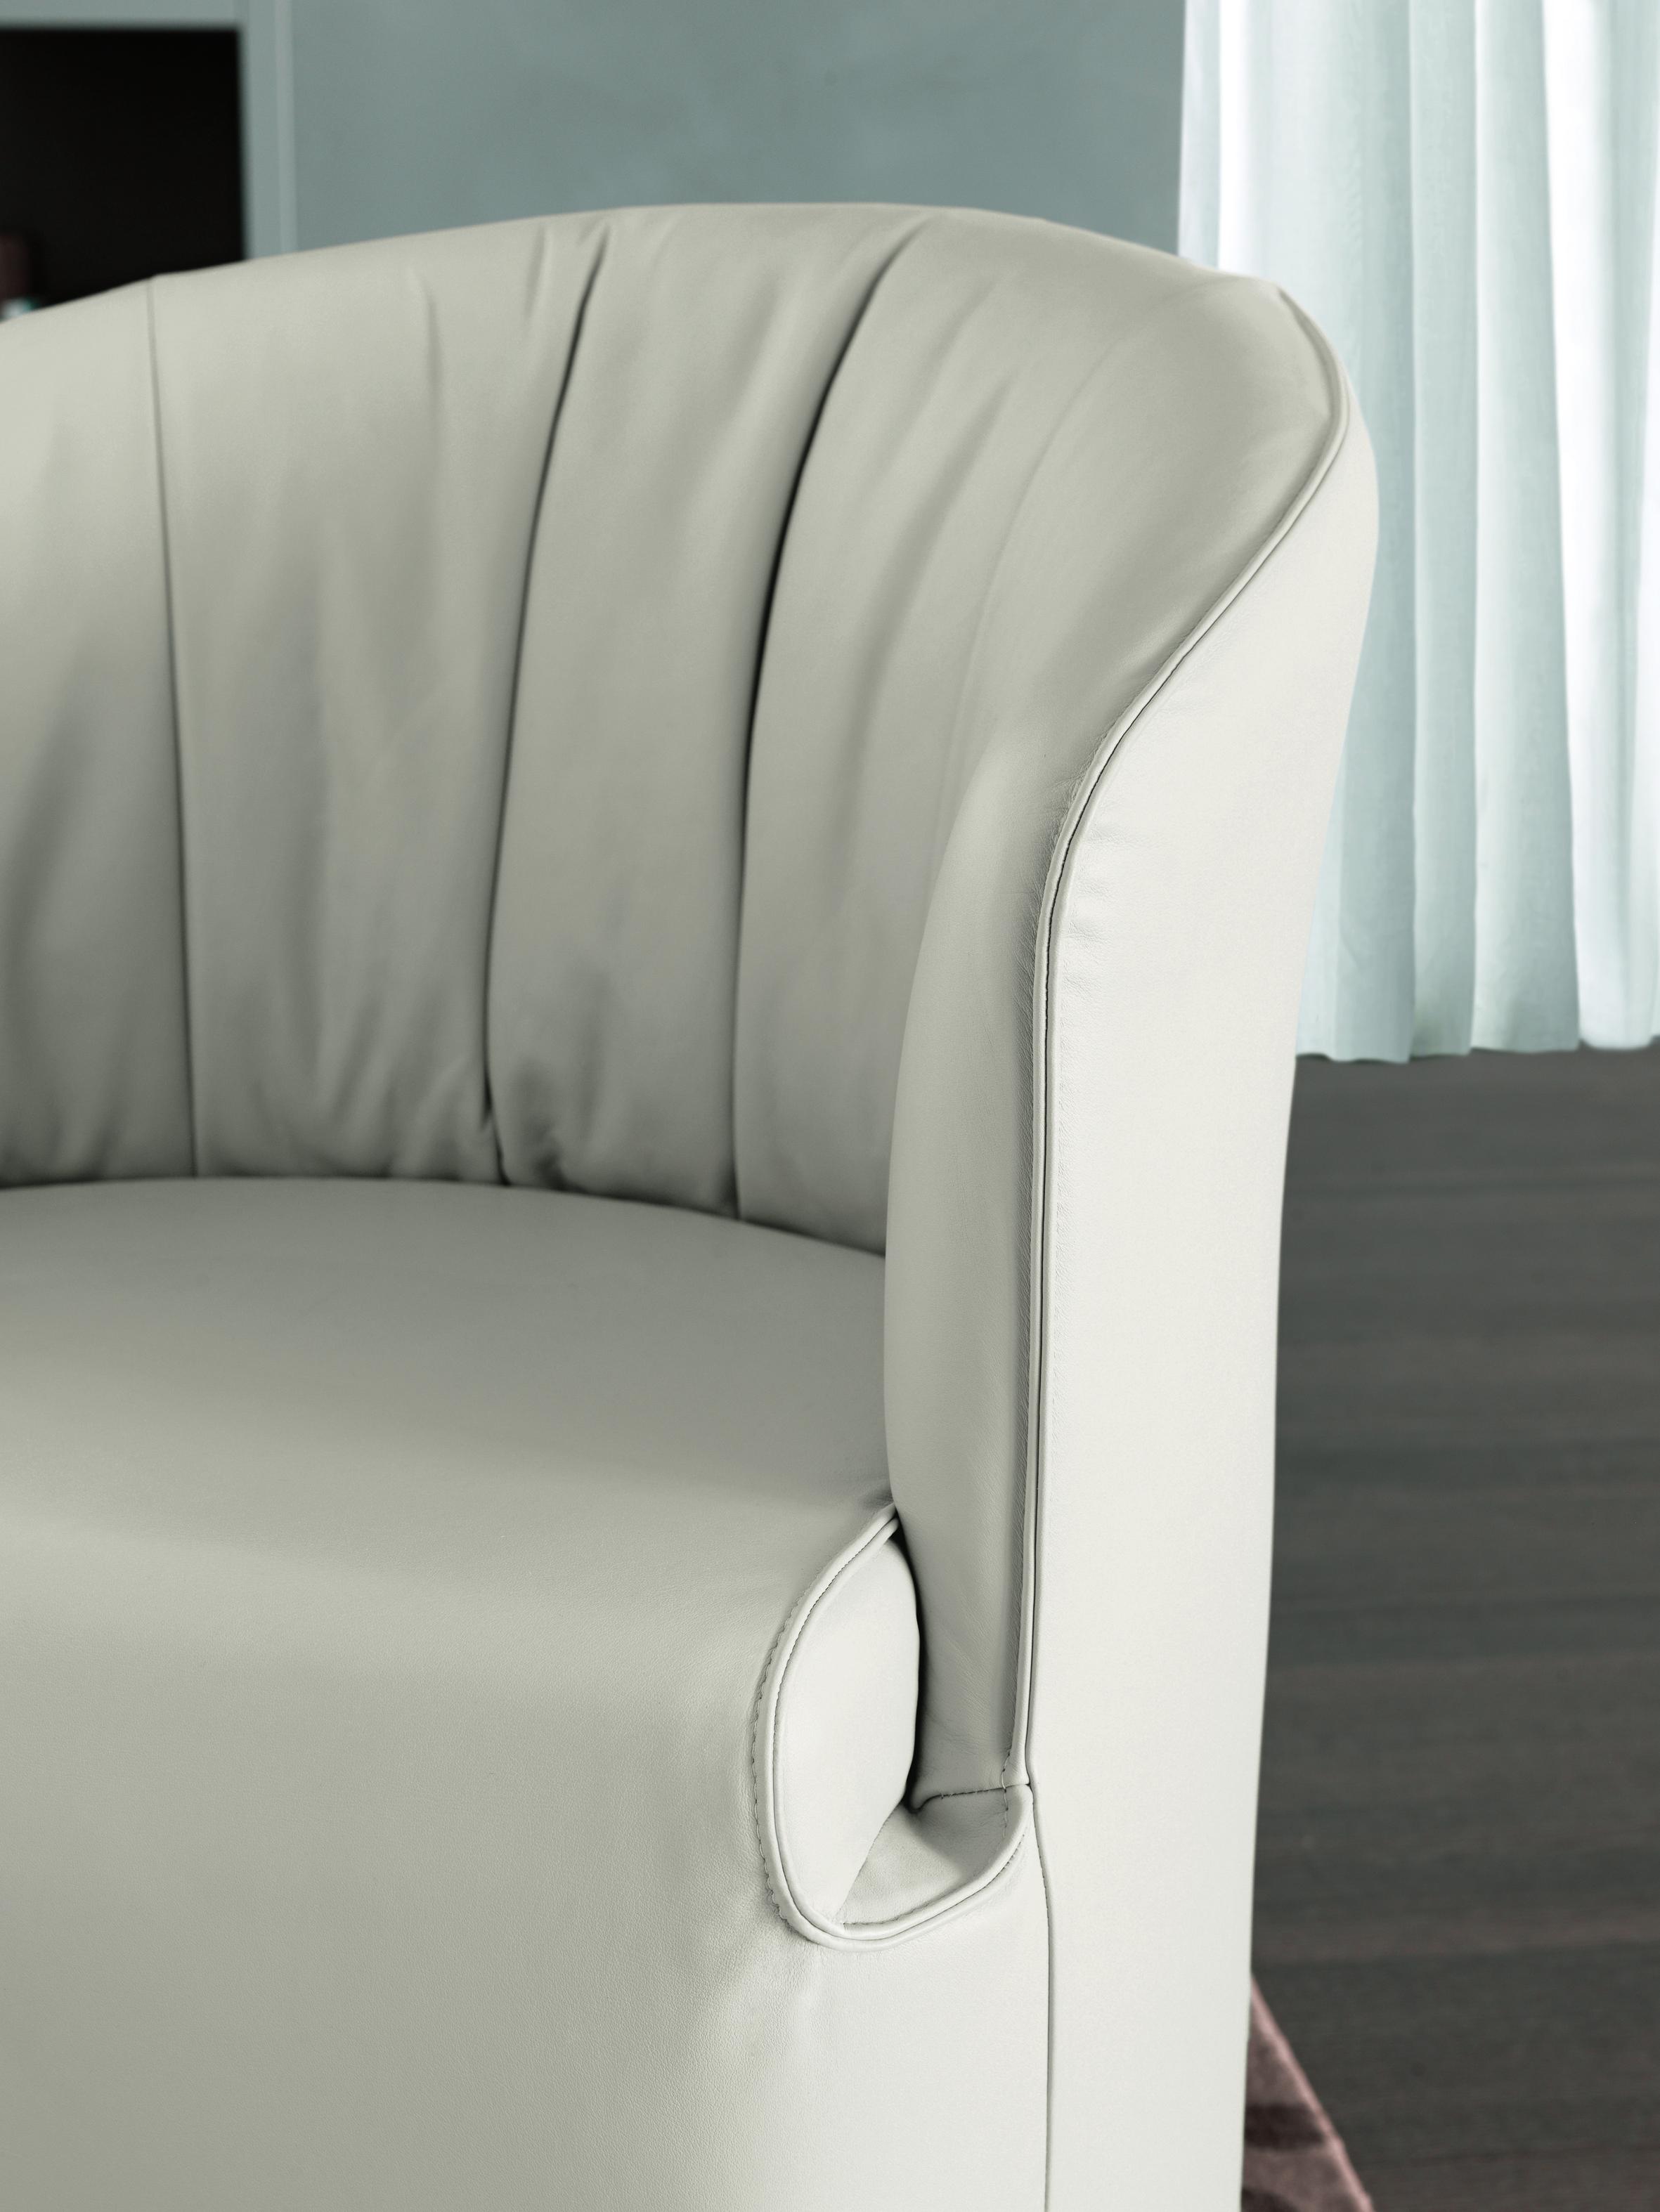 opera-dinner-chair-04-HR.jpg